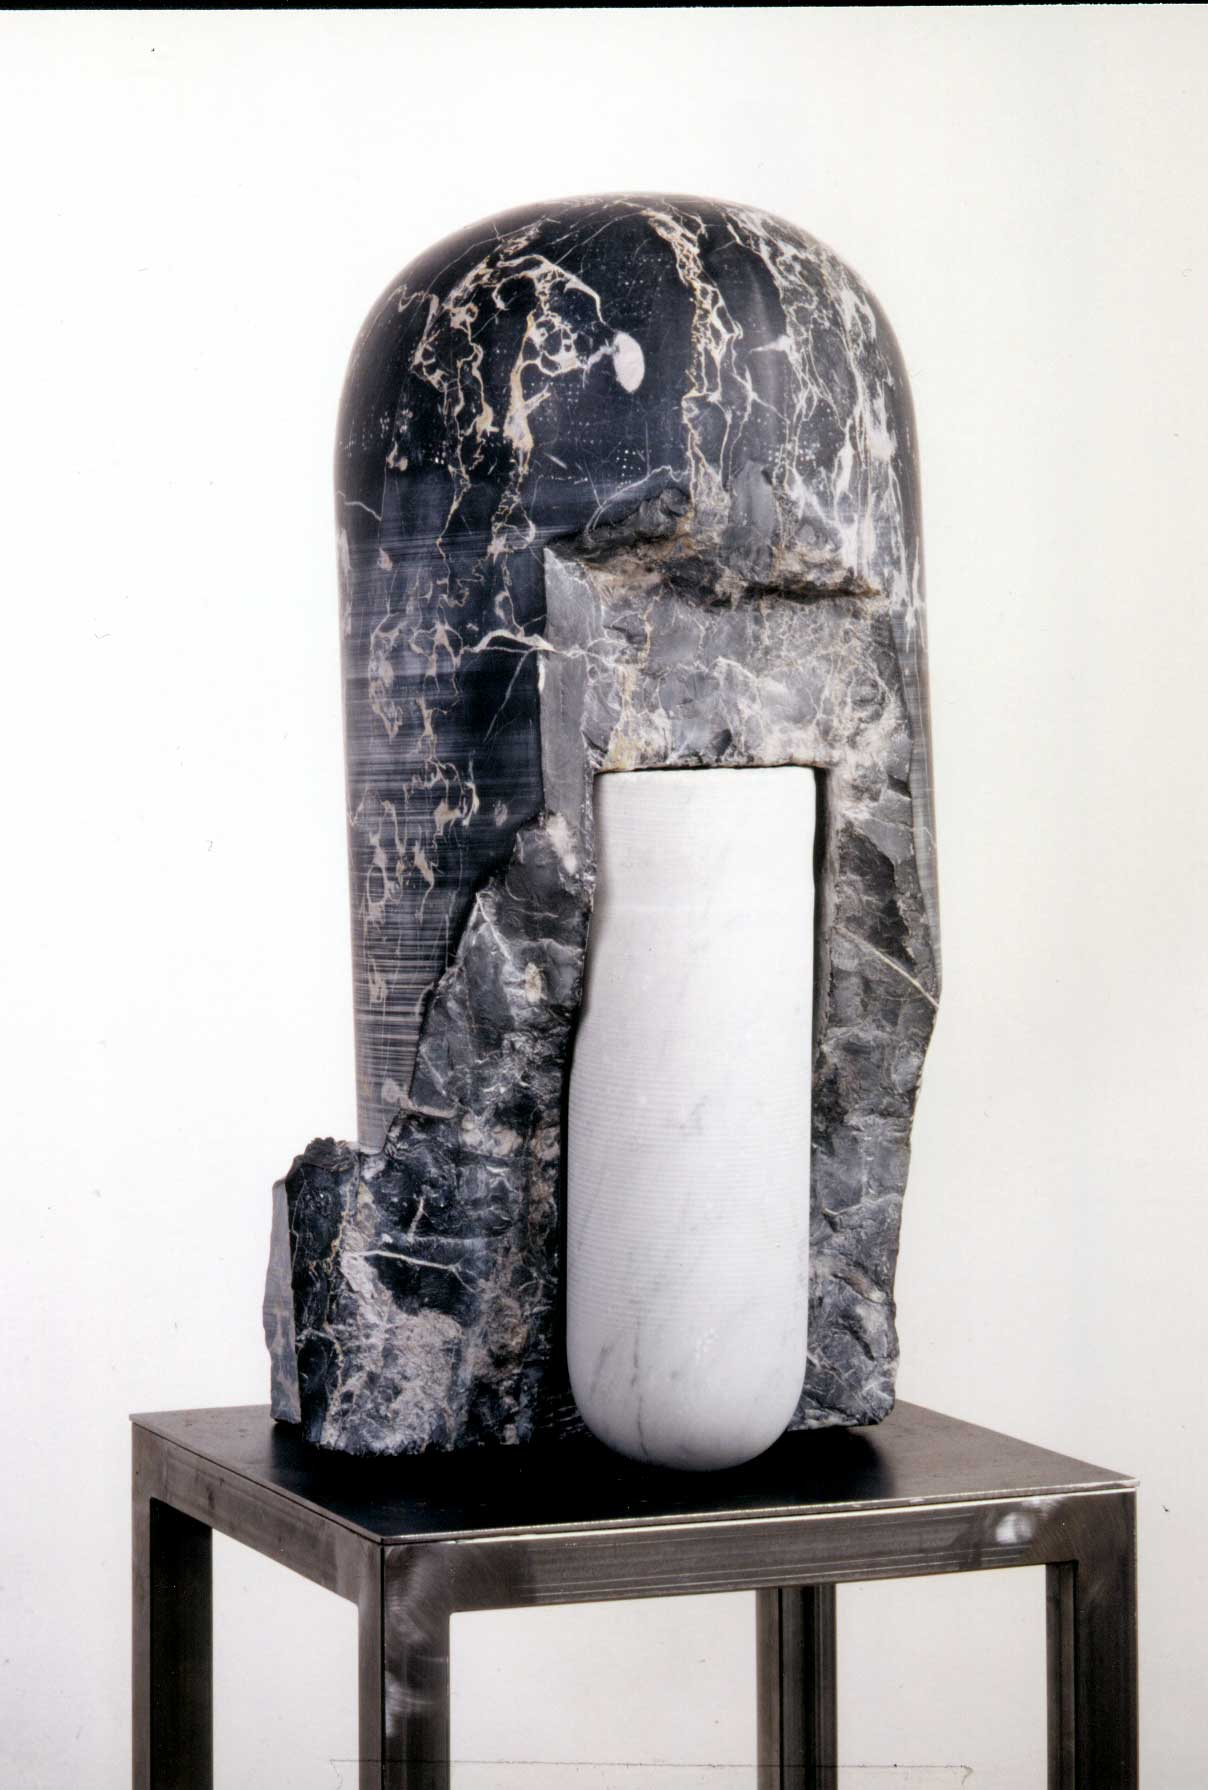 wärter, Portoro- und Carrara Marmor